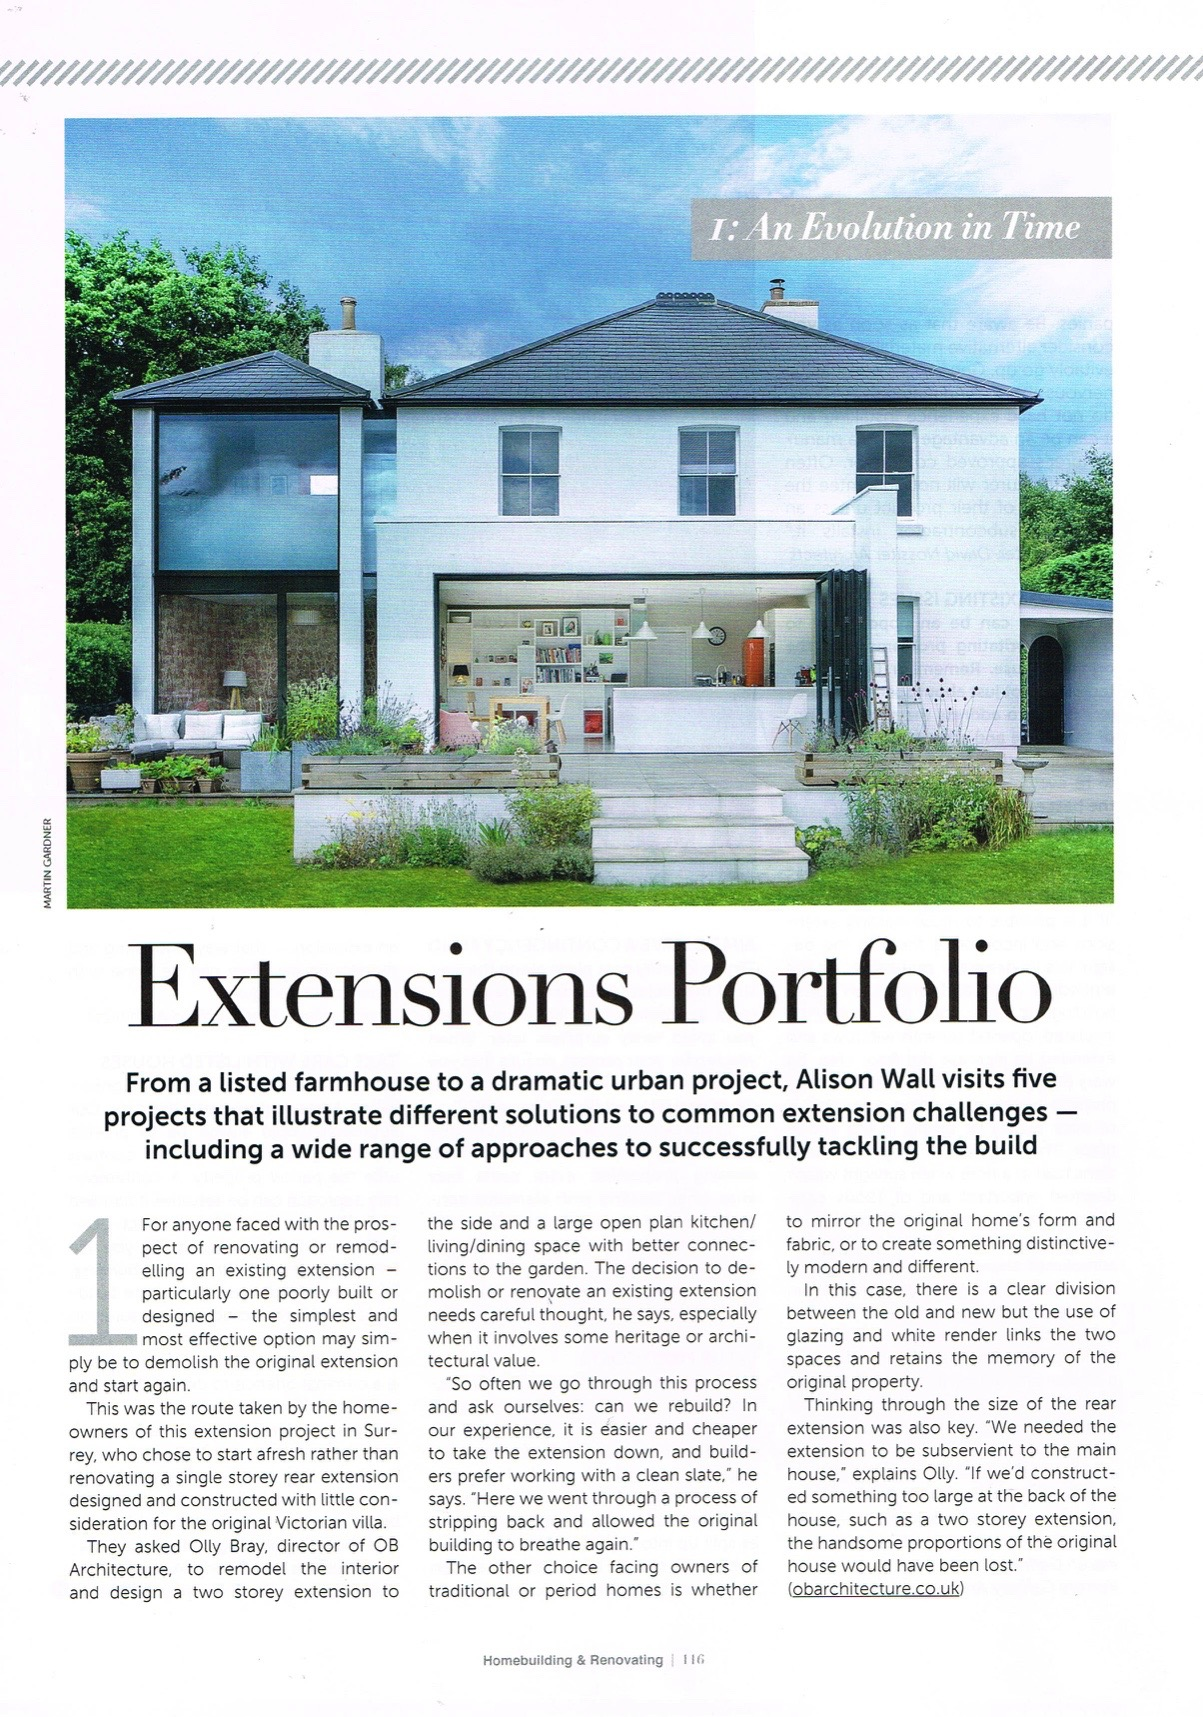 Homebuilding_Renovating_June_2016_Pine_House